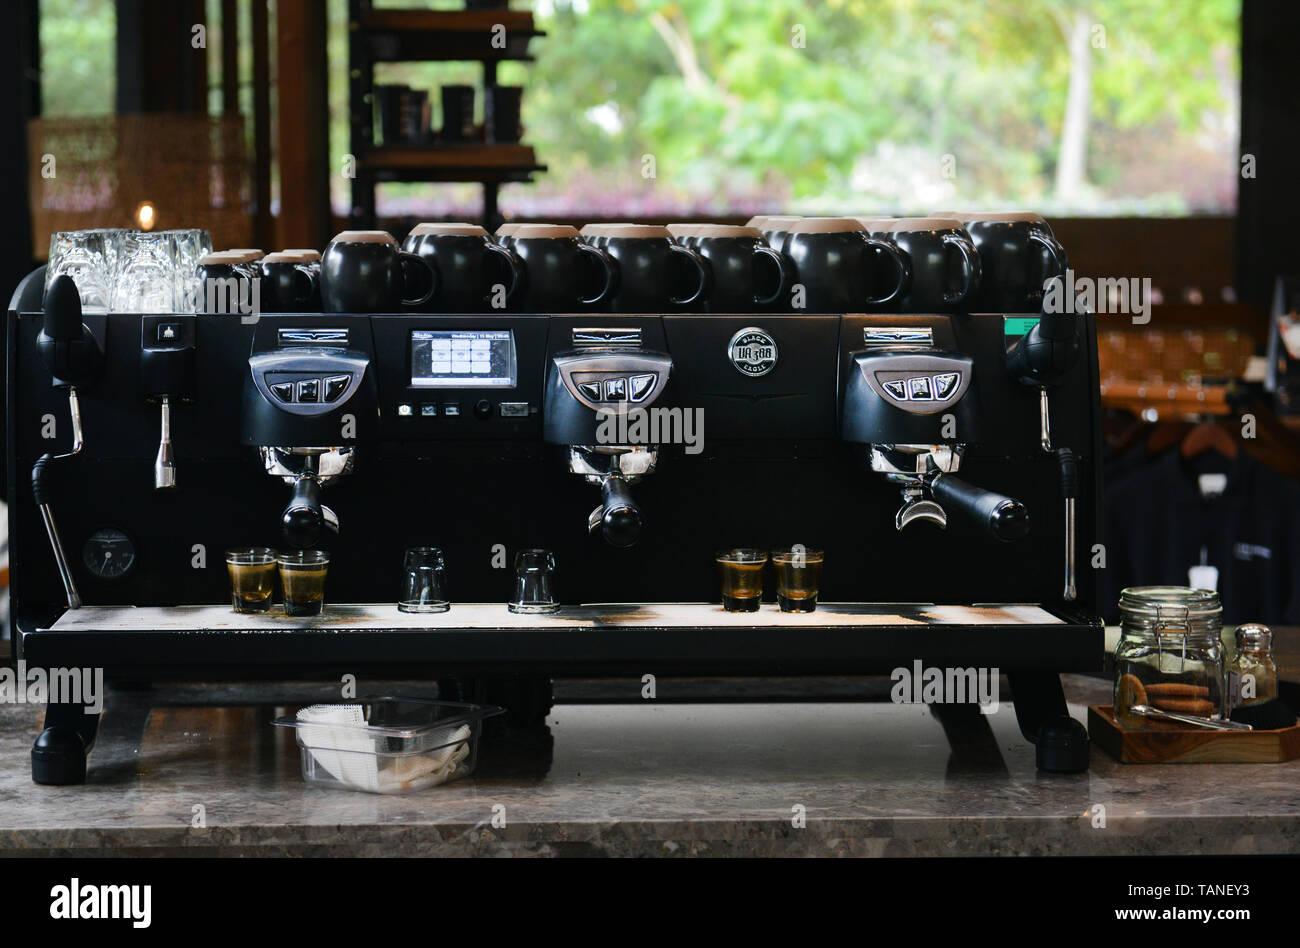 Starbucks Reserve espresso machine. Stock Photo